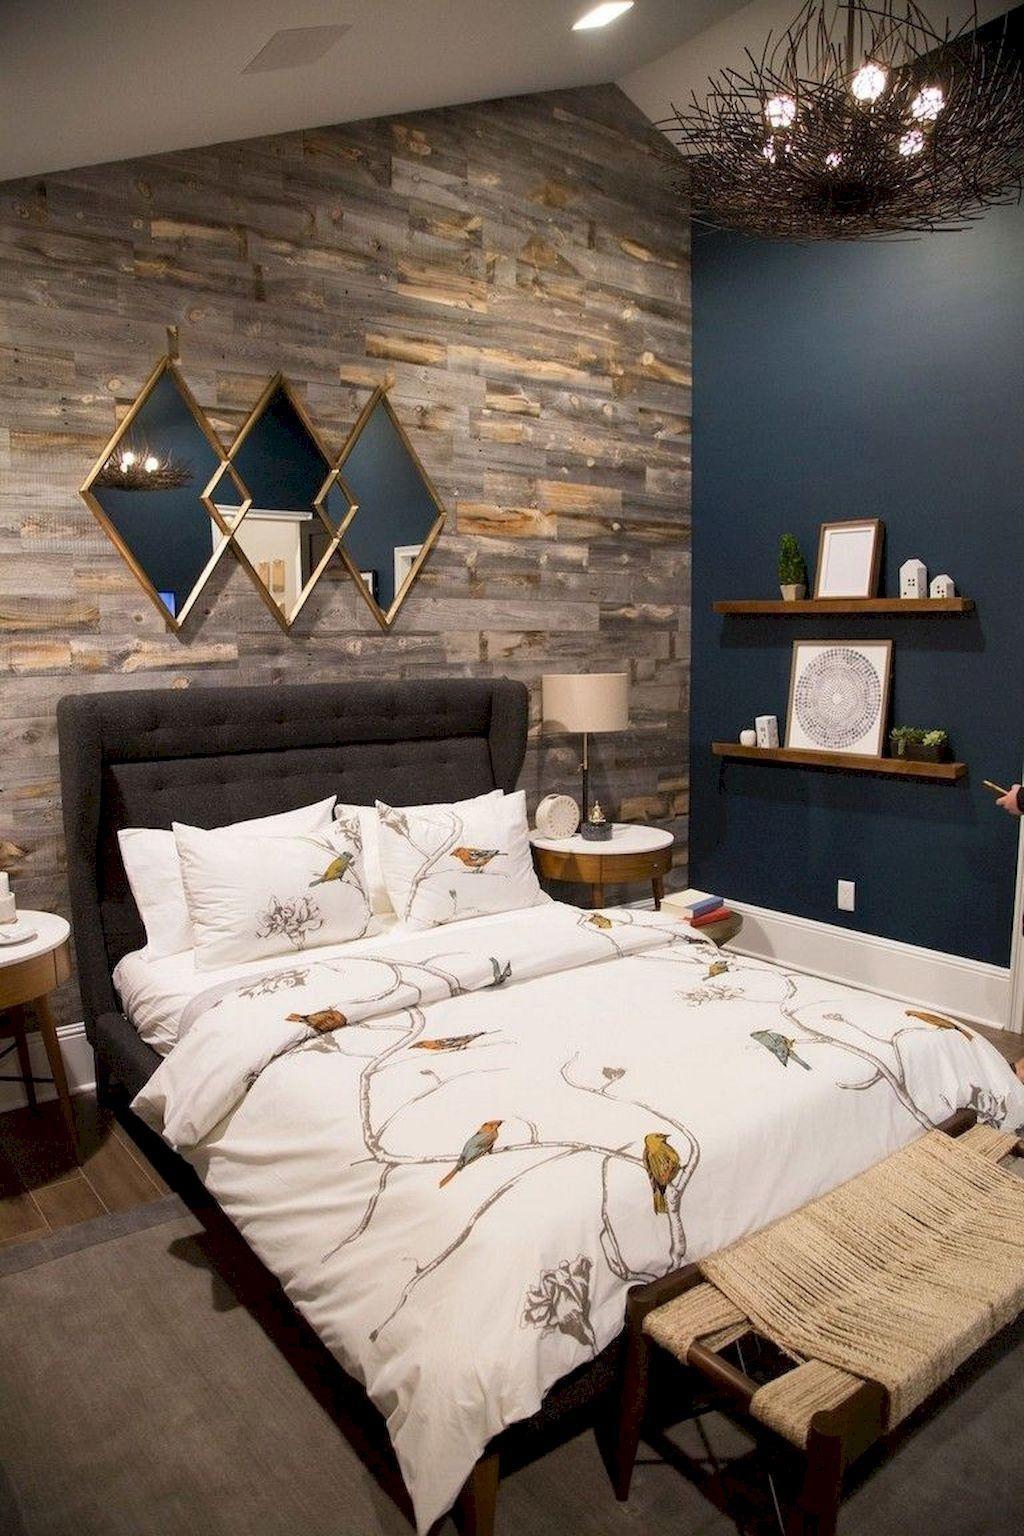 39 Attractive Small Bedroom Design Ideas For Couples To Try Newlywedbedroom 39 Bedroom Ideas For Small Rooms Women Apartment Bedroom Decor Newlywed Bedroom